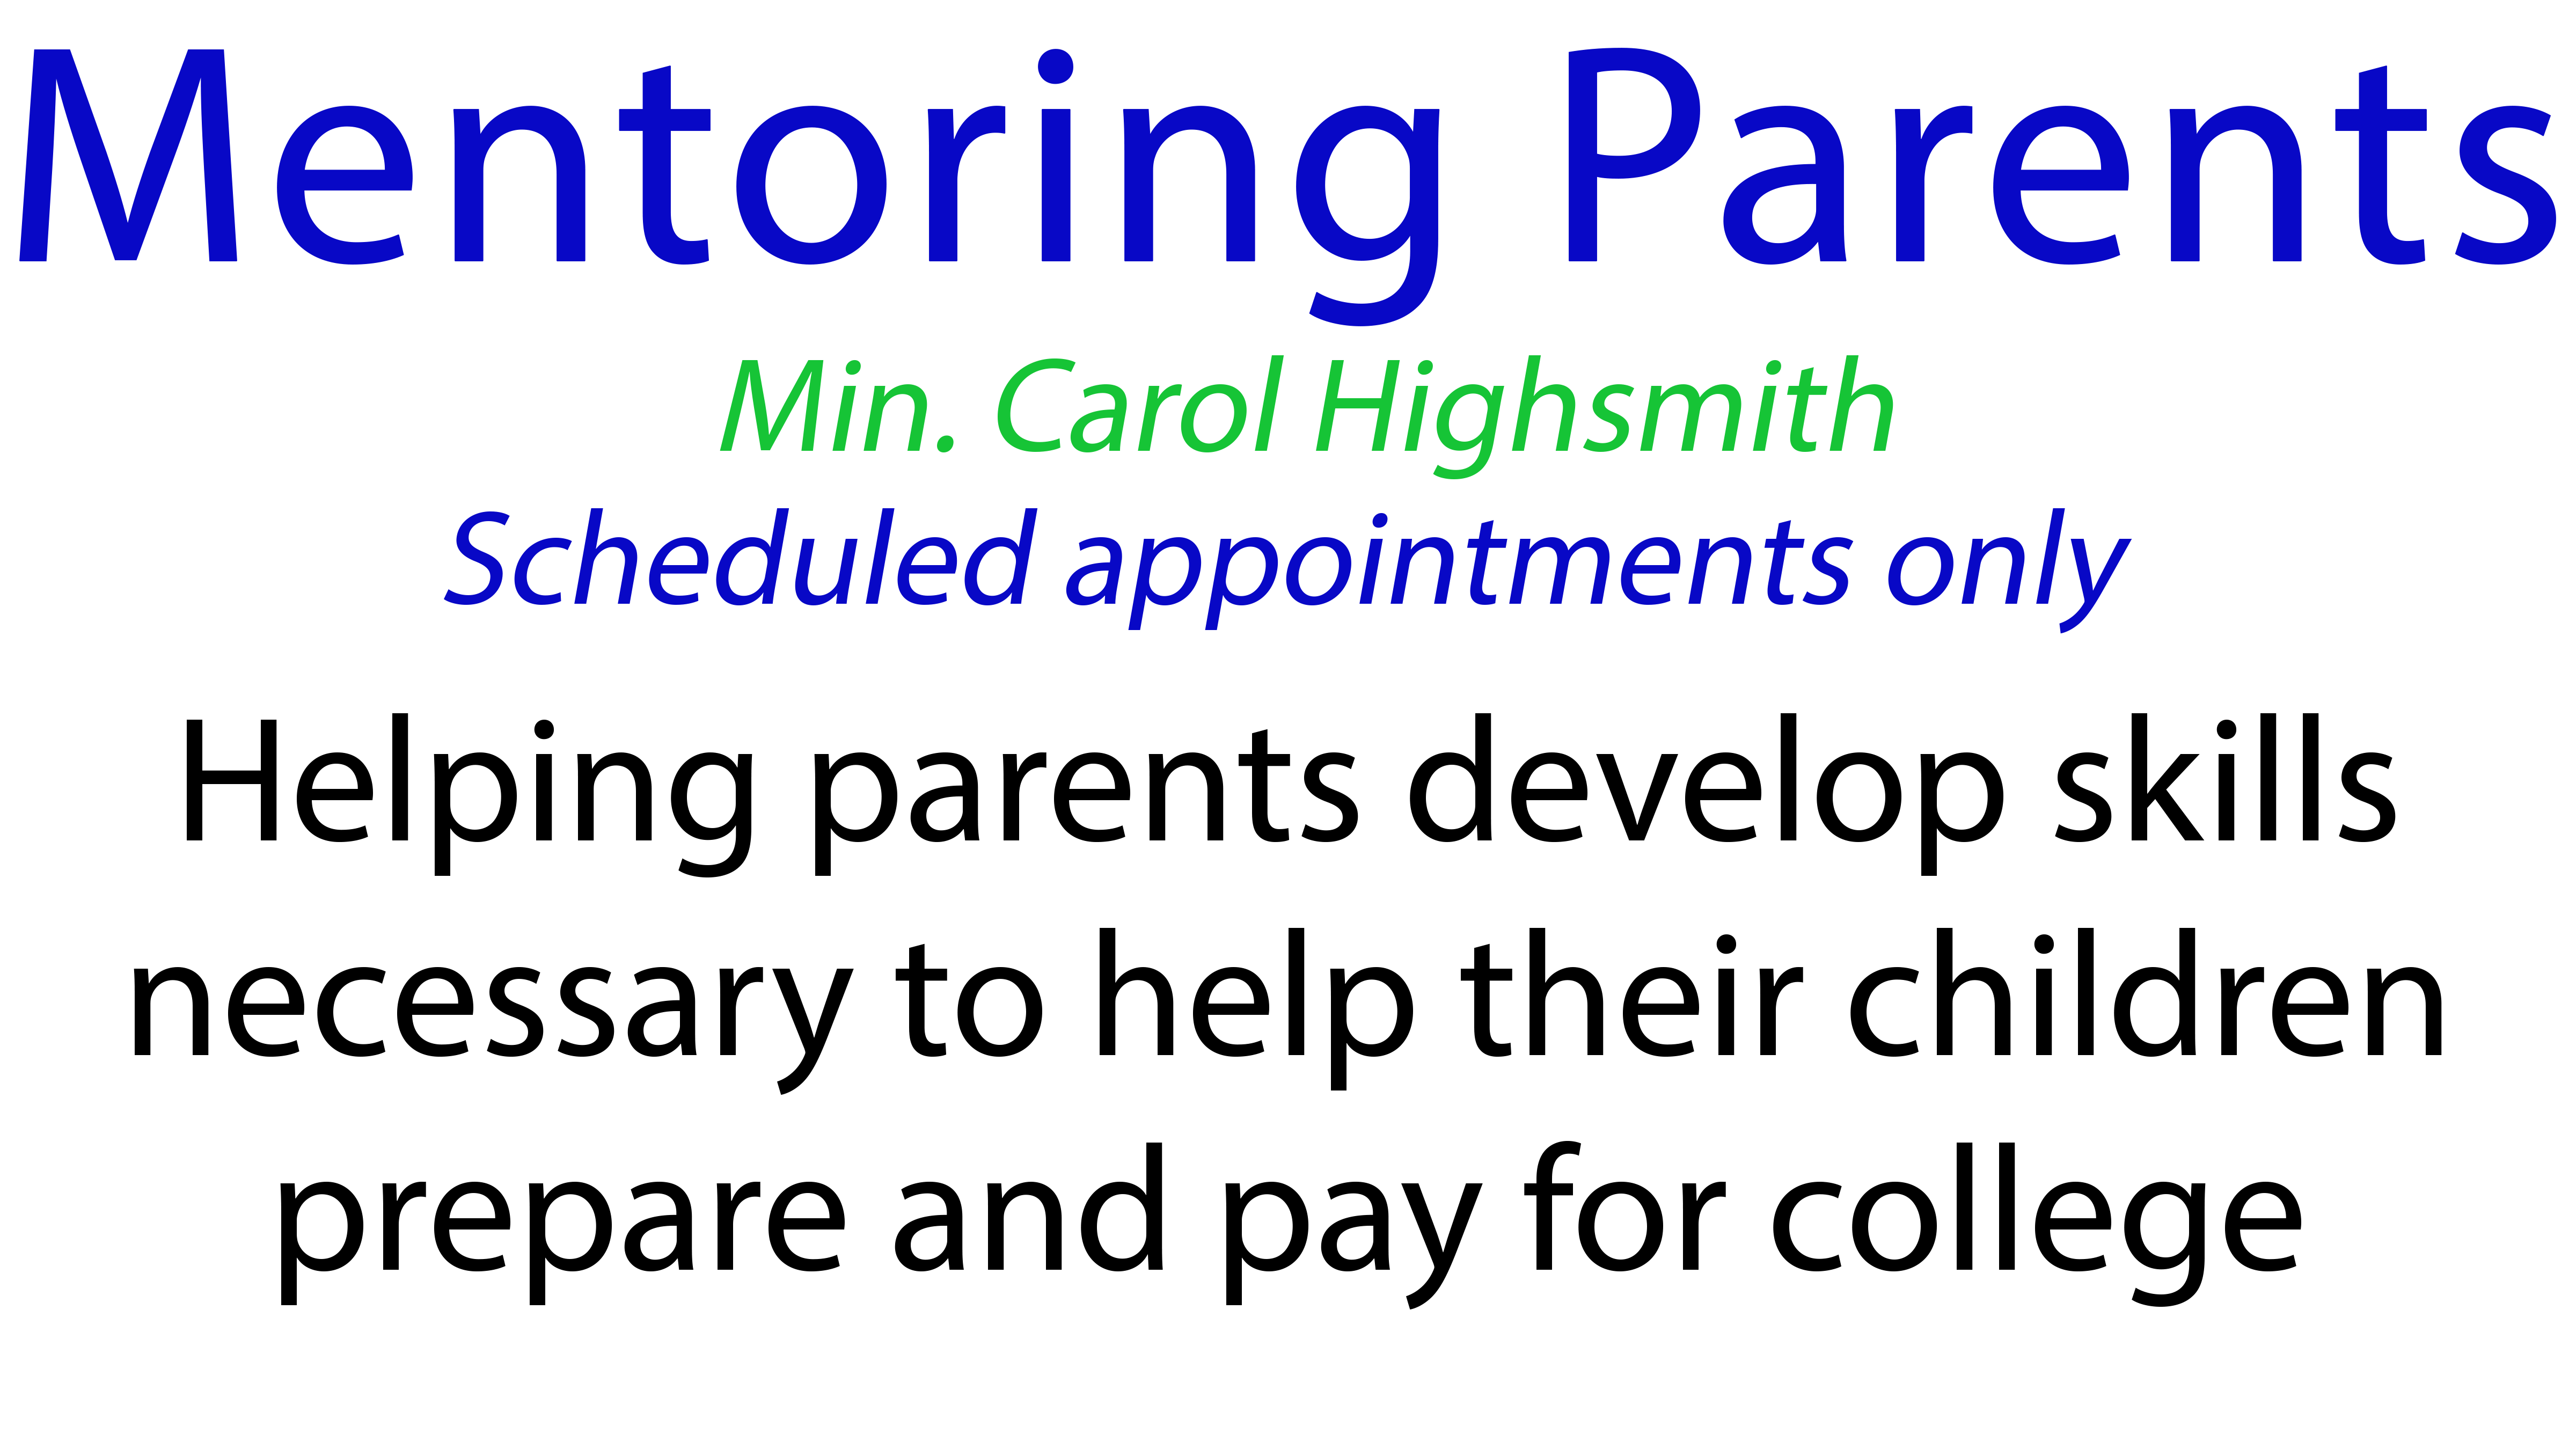 /Images/newbeginningschurch/site/images/groups/mentor_parents.png